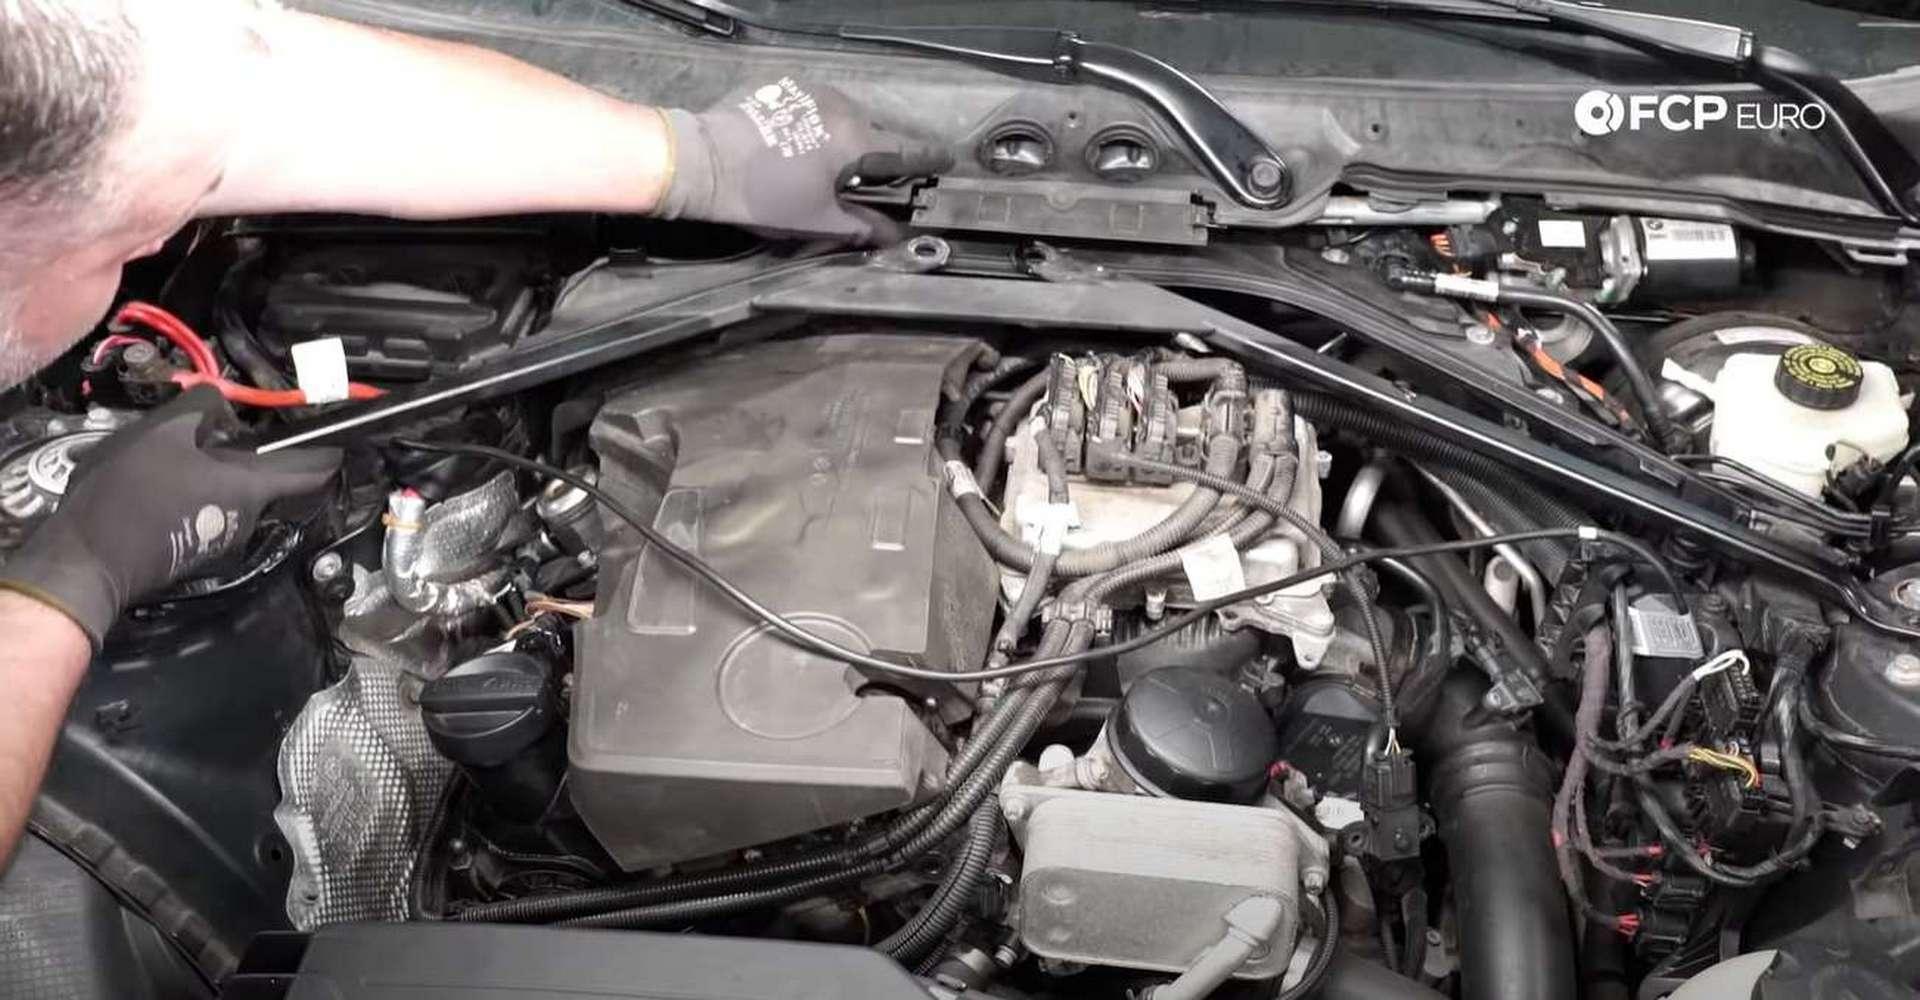 22-DIY-BMW-F30-High-Pressure-Fuel-Pump-Replacement_Refitting-Plastics